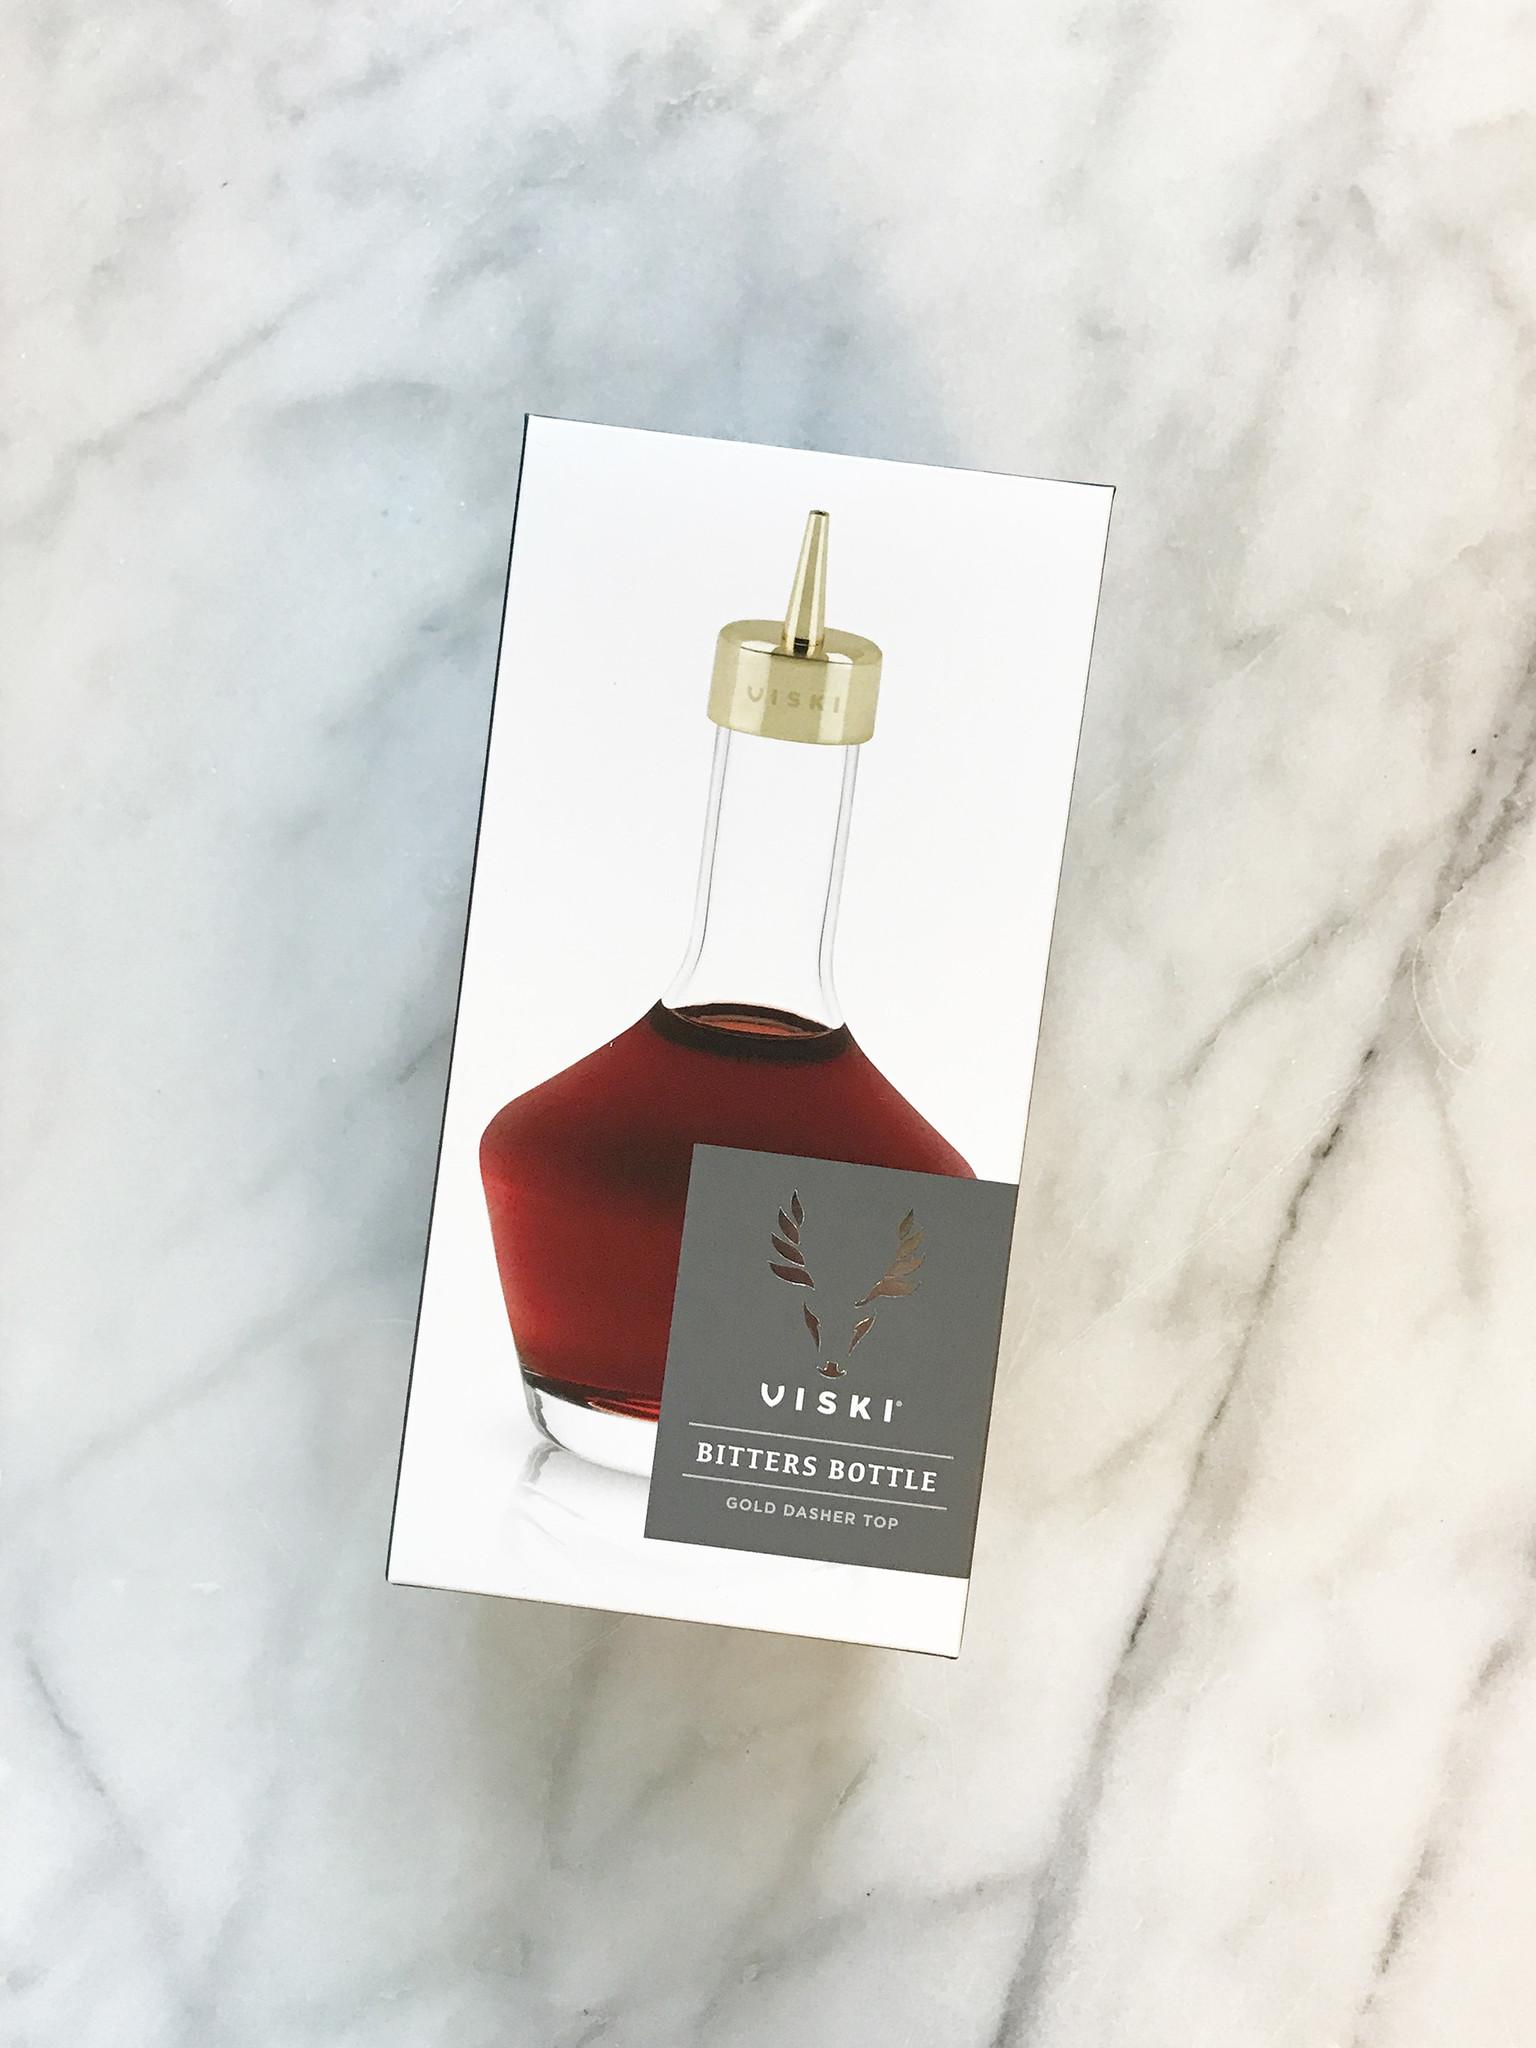 Viski Bitters Bottle with Gold Dasher Top-1